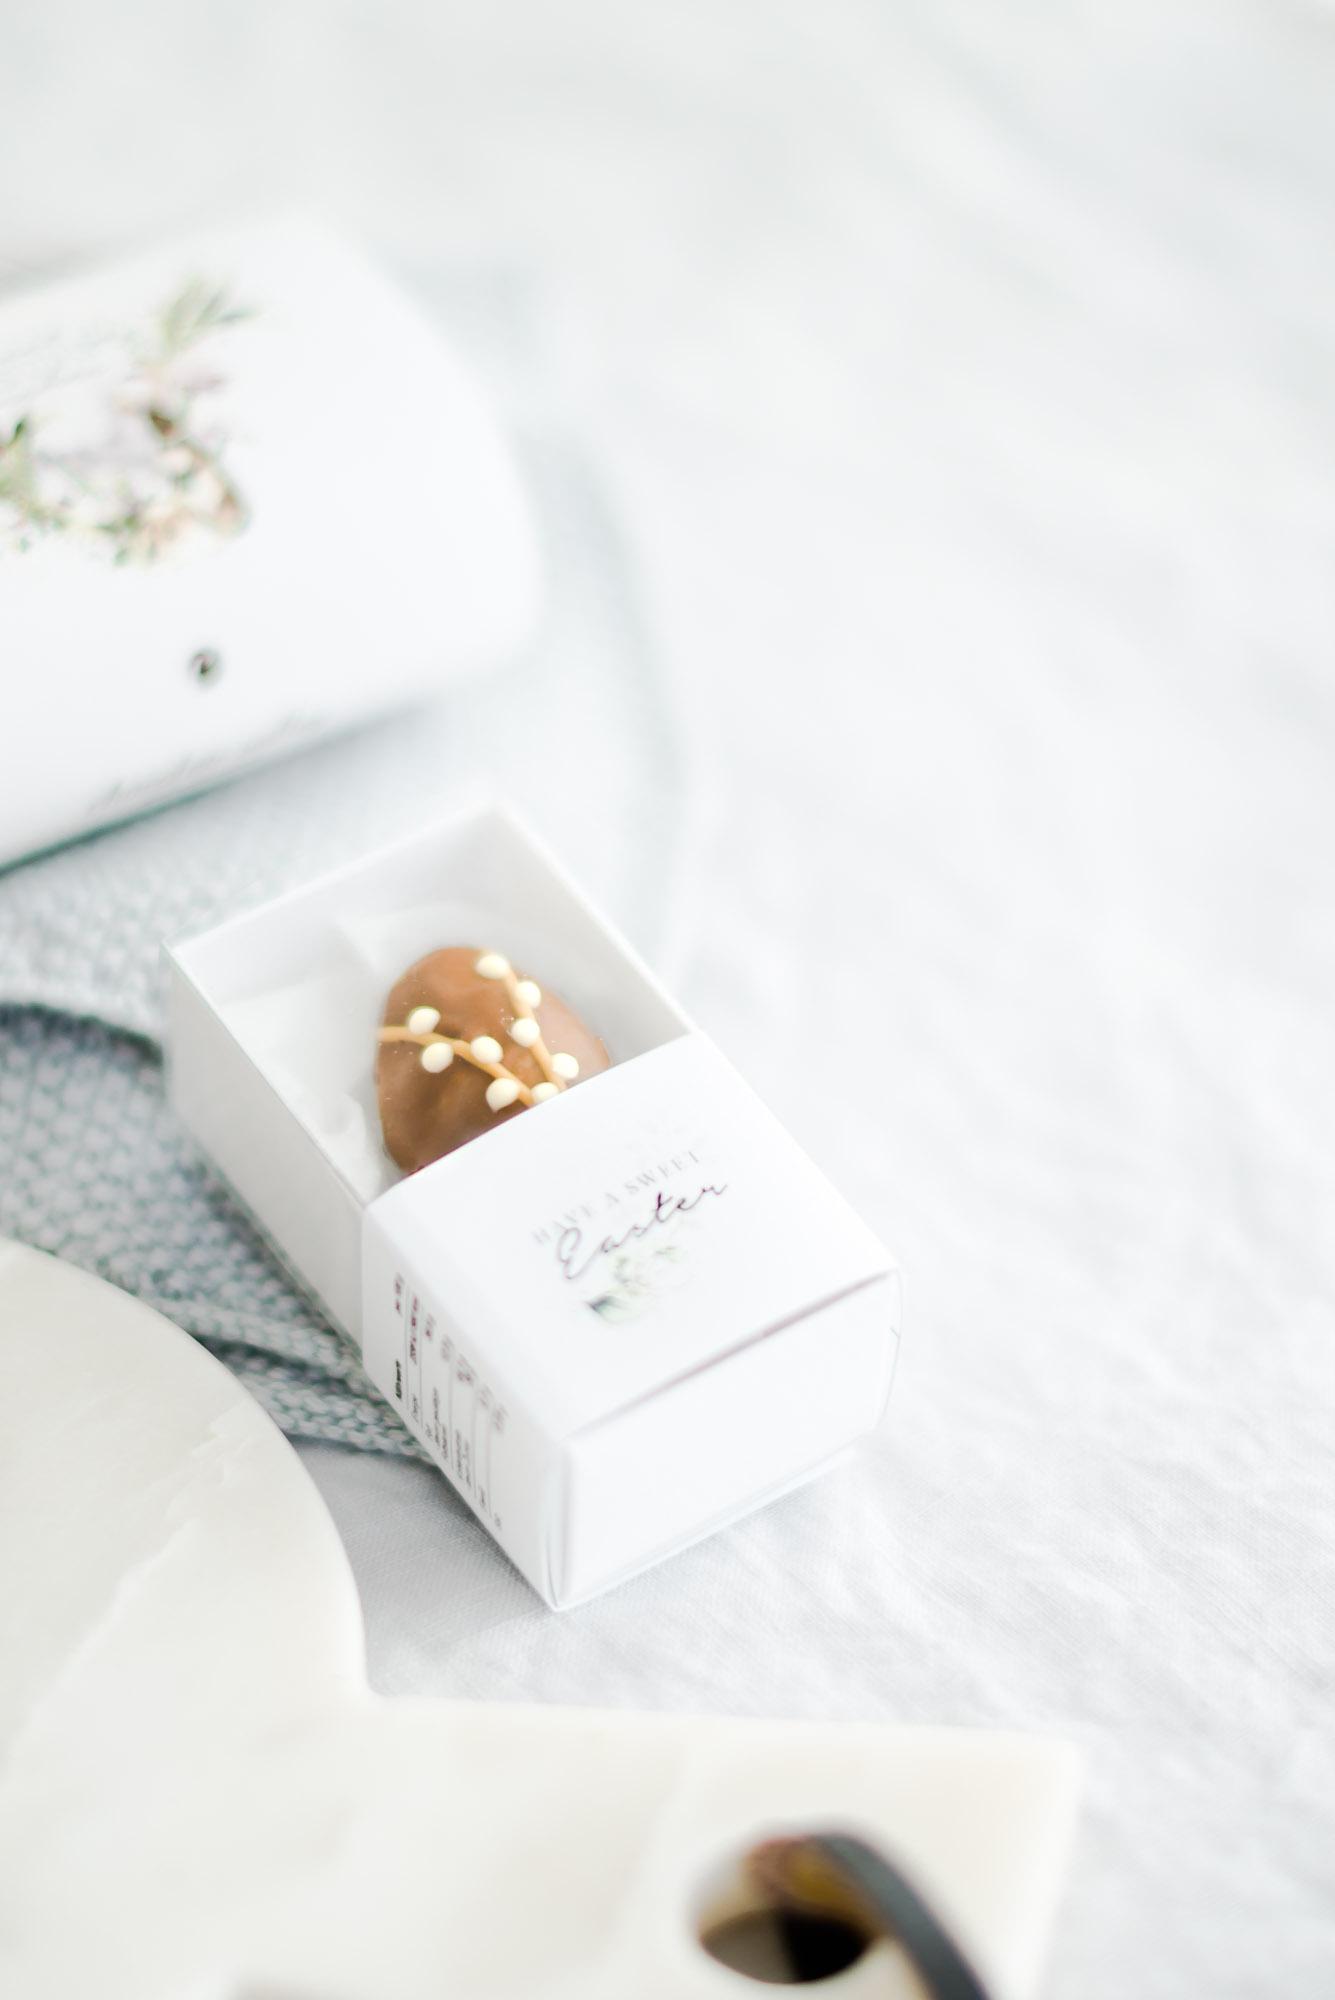 Handbemalte Osterei Praline groß in Schachtel